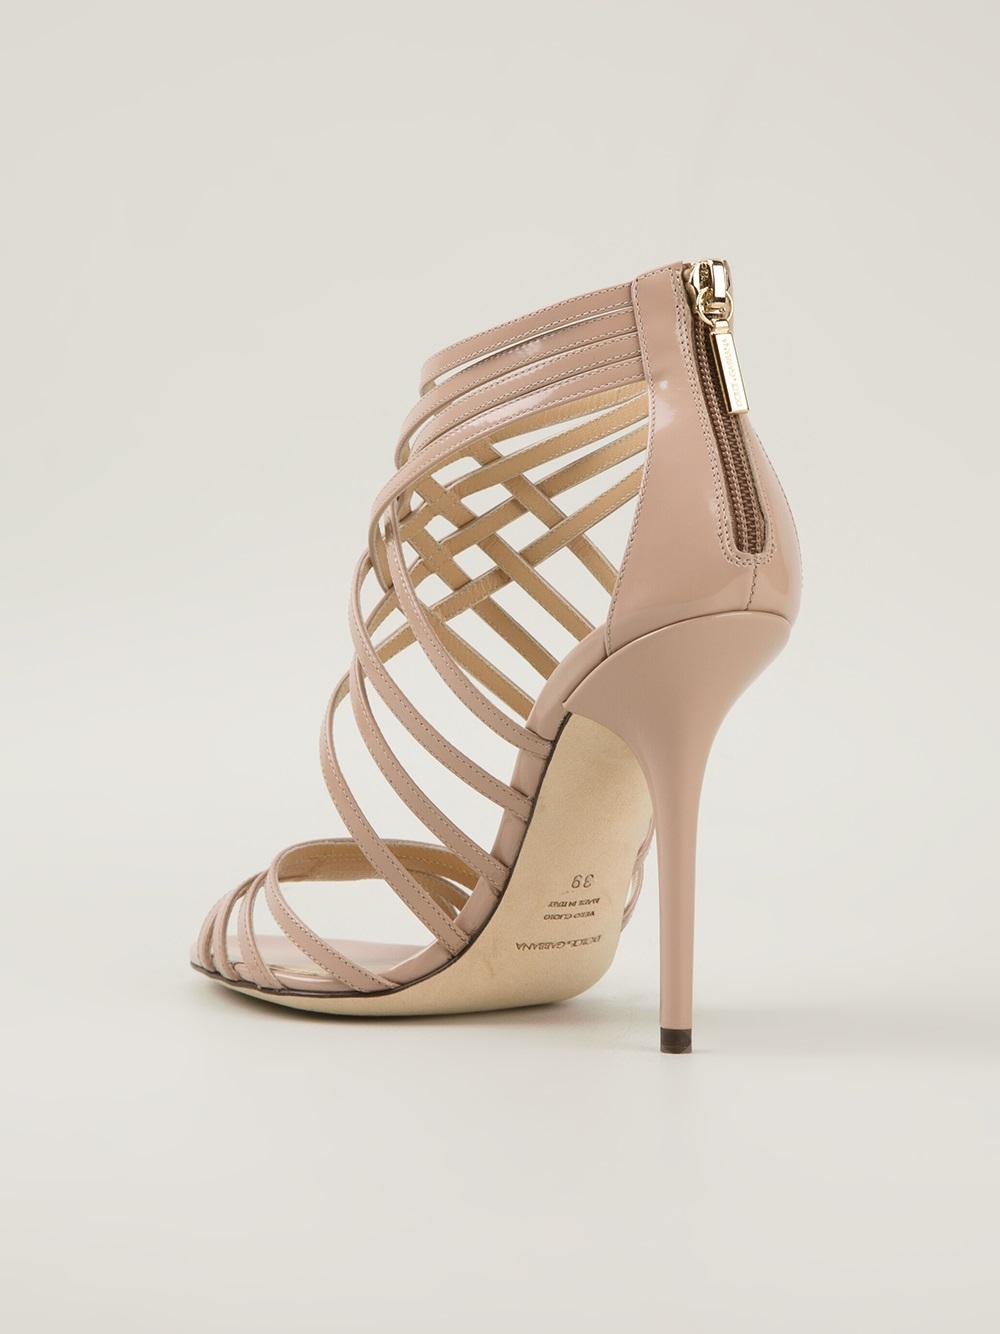 4fce7263ce33 Lyst - Dolce   Gabbana High Heel Sandals in Natural